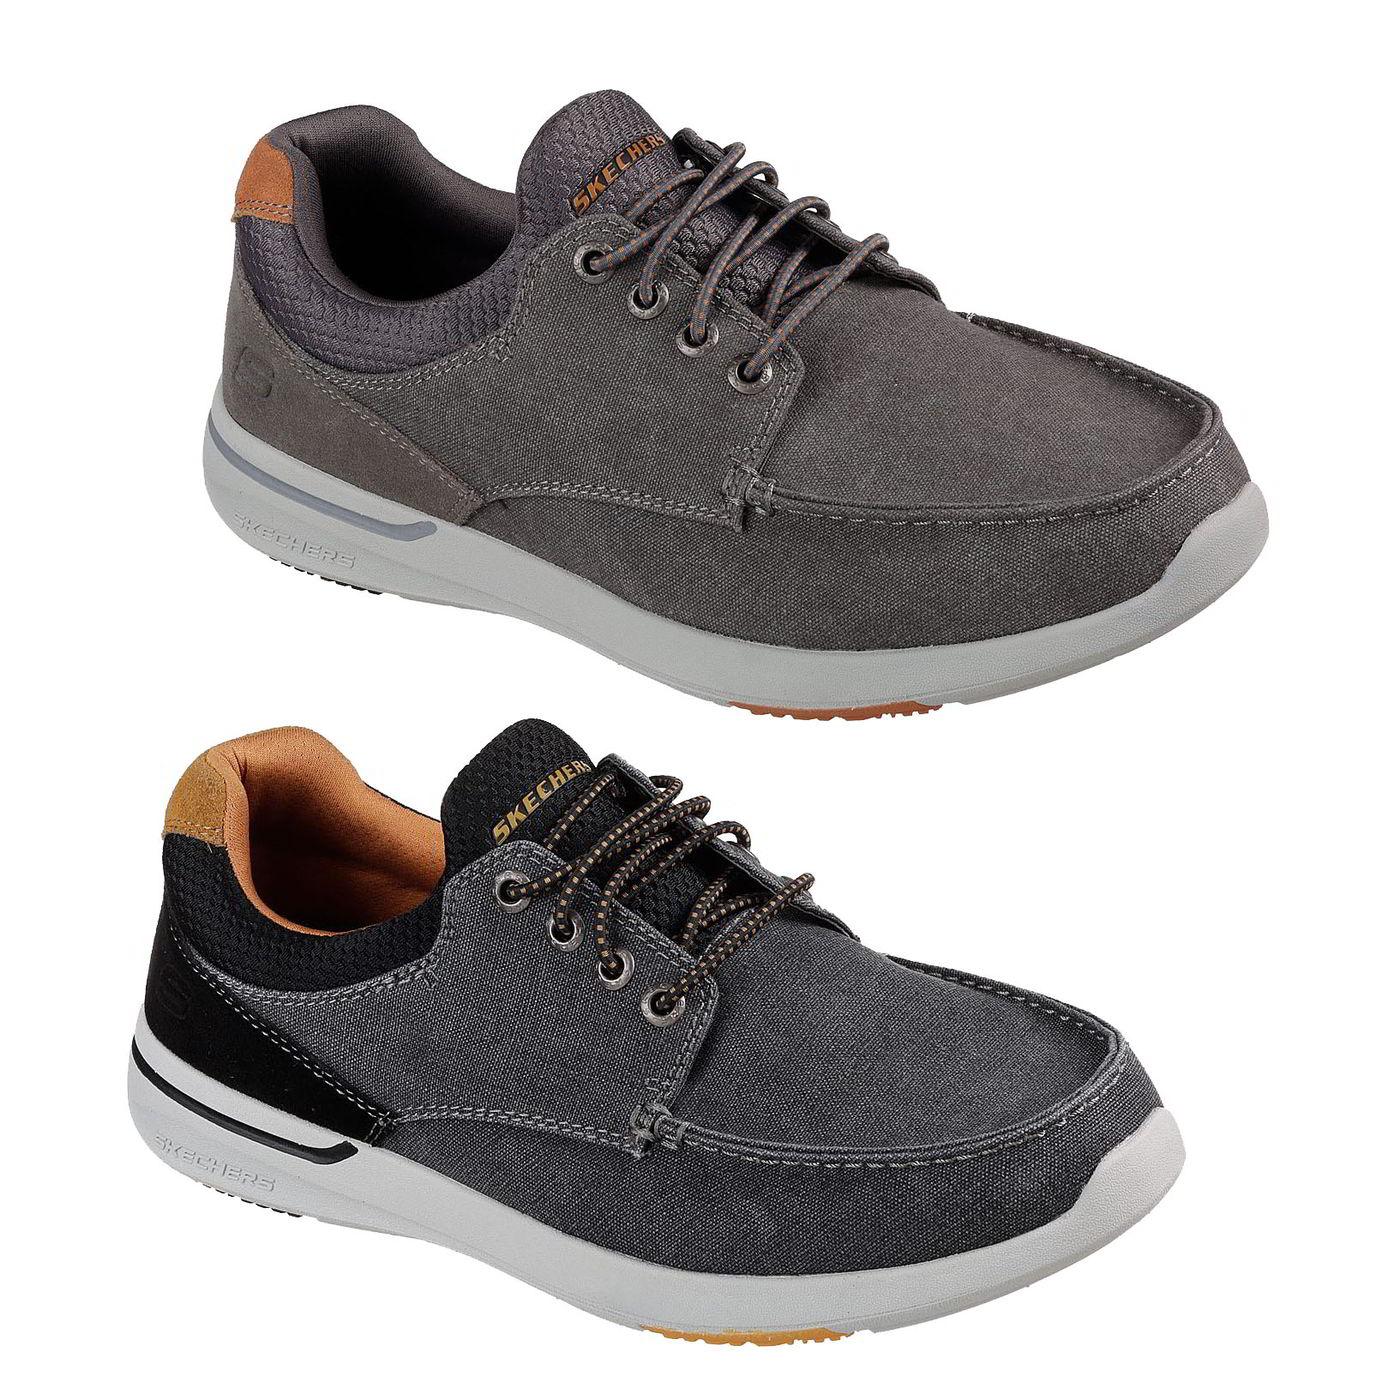 2899b2fb922d Skechers Elent Mosen Mens Canvas Boat Deck Shoes Black Grey Size 7 ...